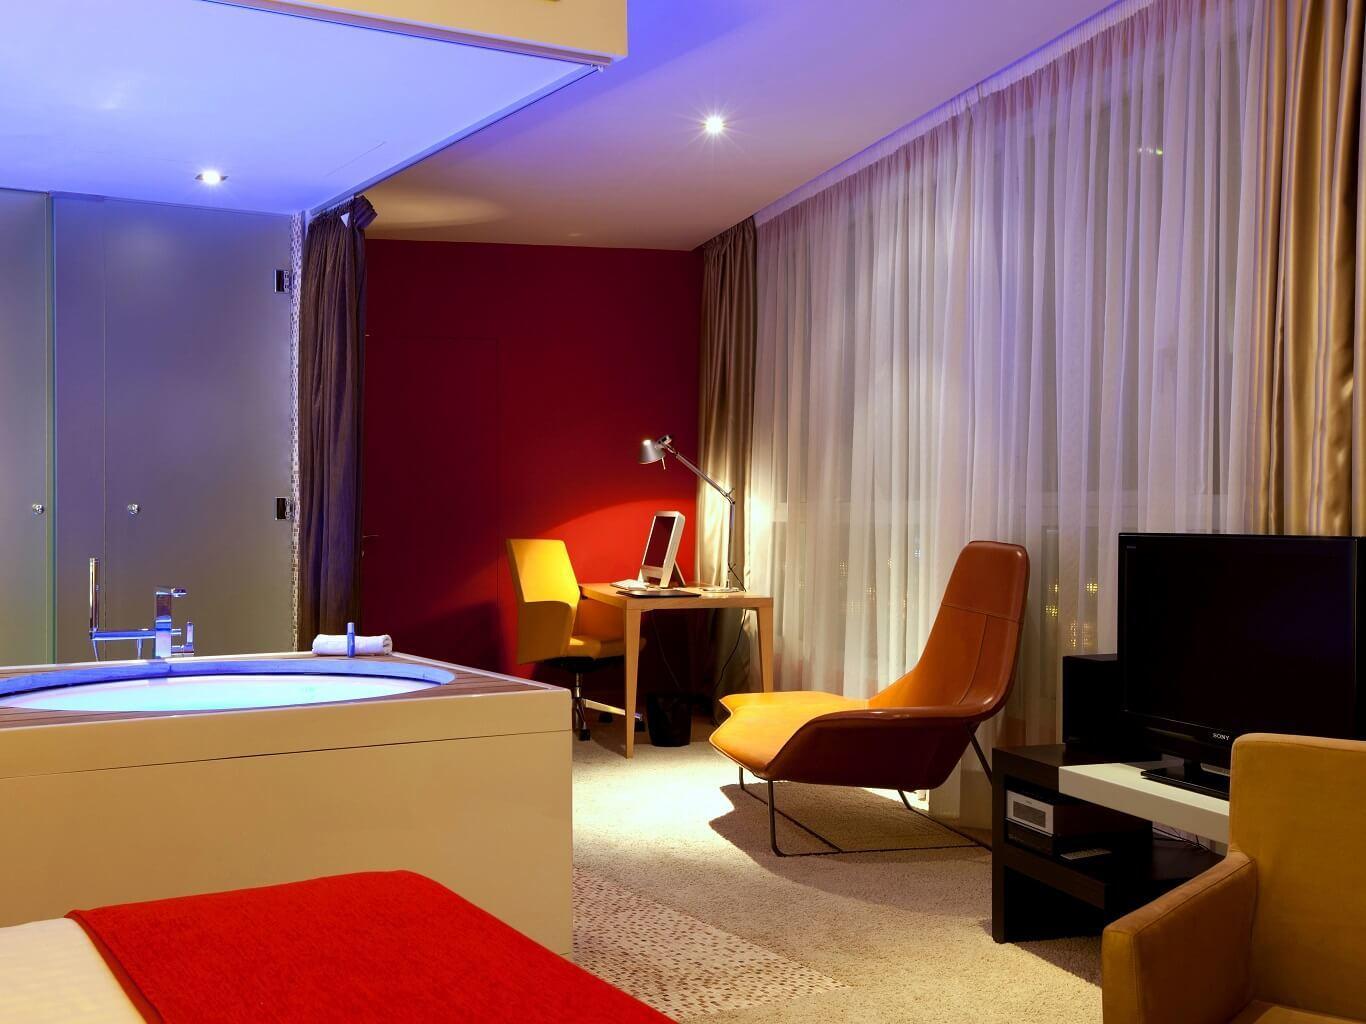 Hotel barcelone jacuzzi dans la chambre perfect hotel - Hotel avec jacuzzi dans la chambre espagne ...